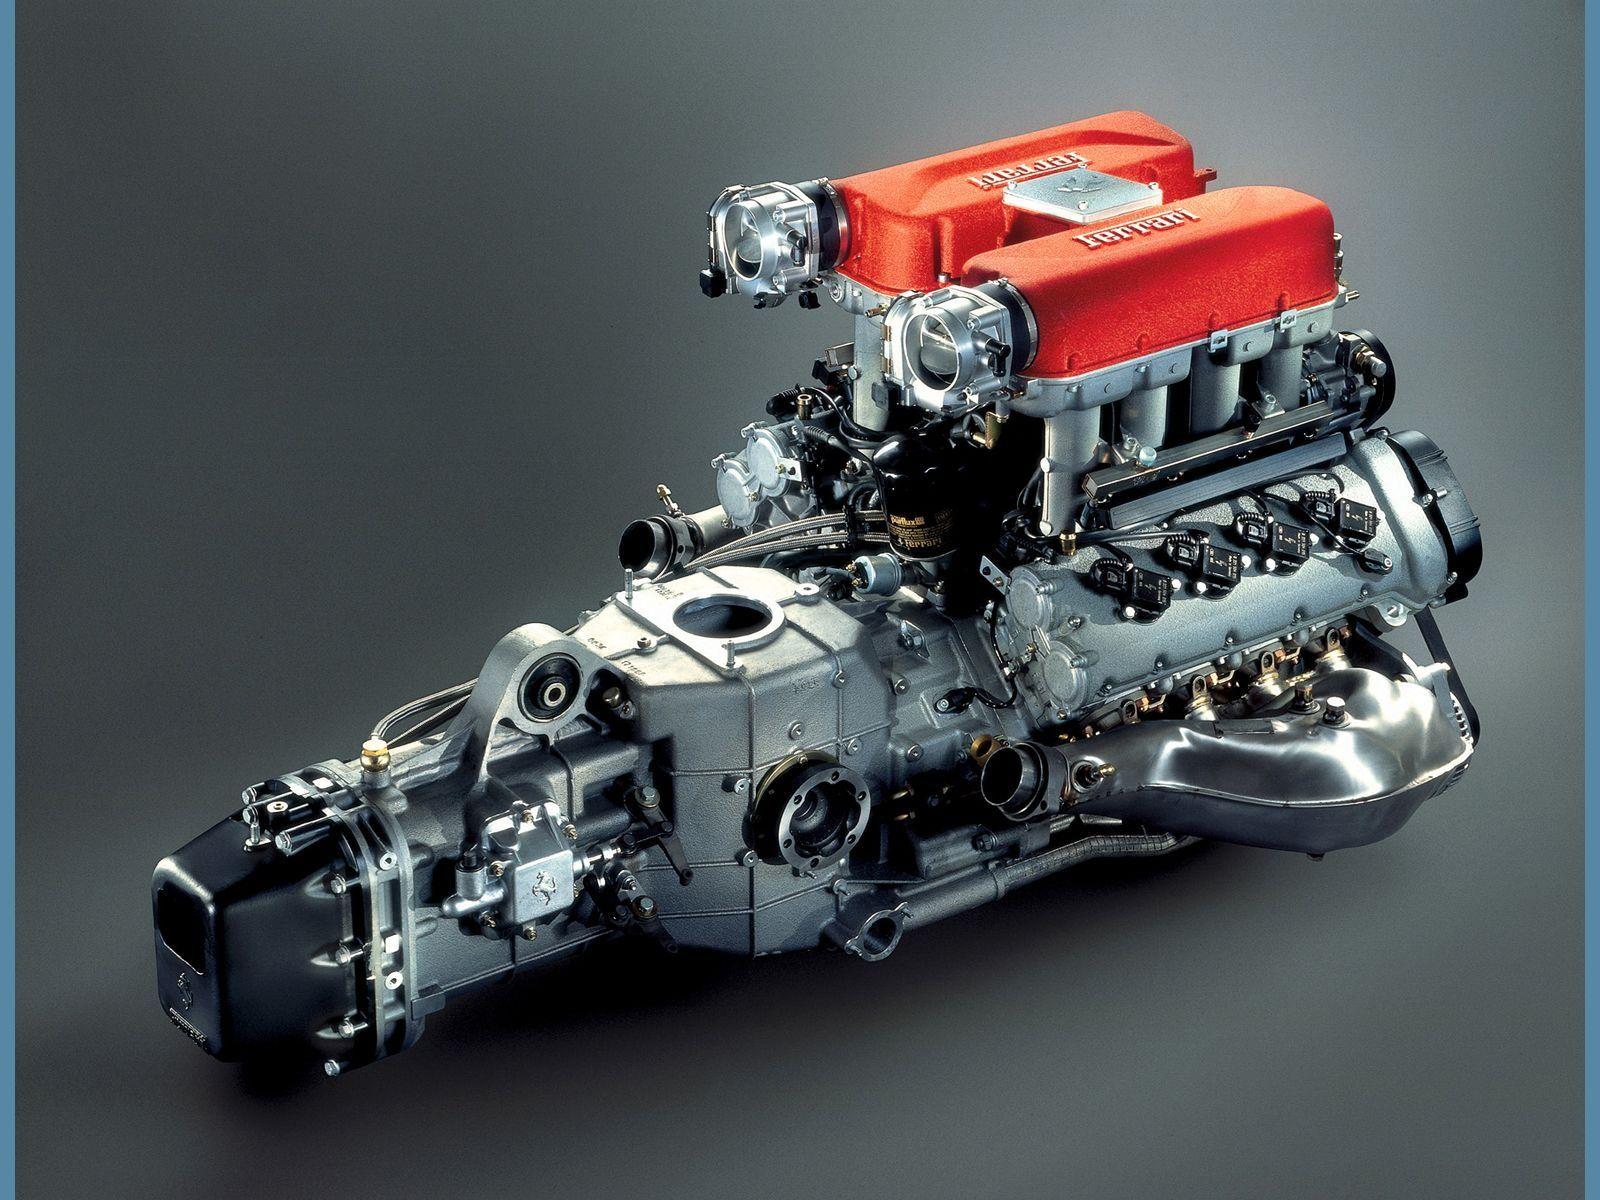 Ferrari 360 Modena Engine 400bhp 8500rpm Redline 3 7l 225ci 0 62 N 4 5sec Normally Aspirated V8 A Modern Work Of A Ferrari 360 Race Engines Engineering